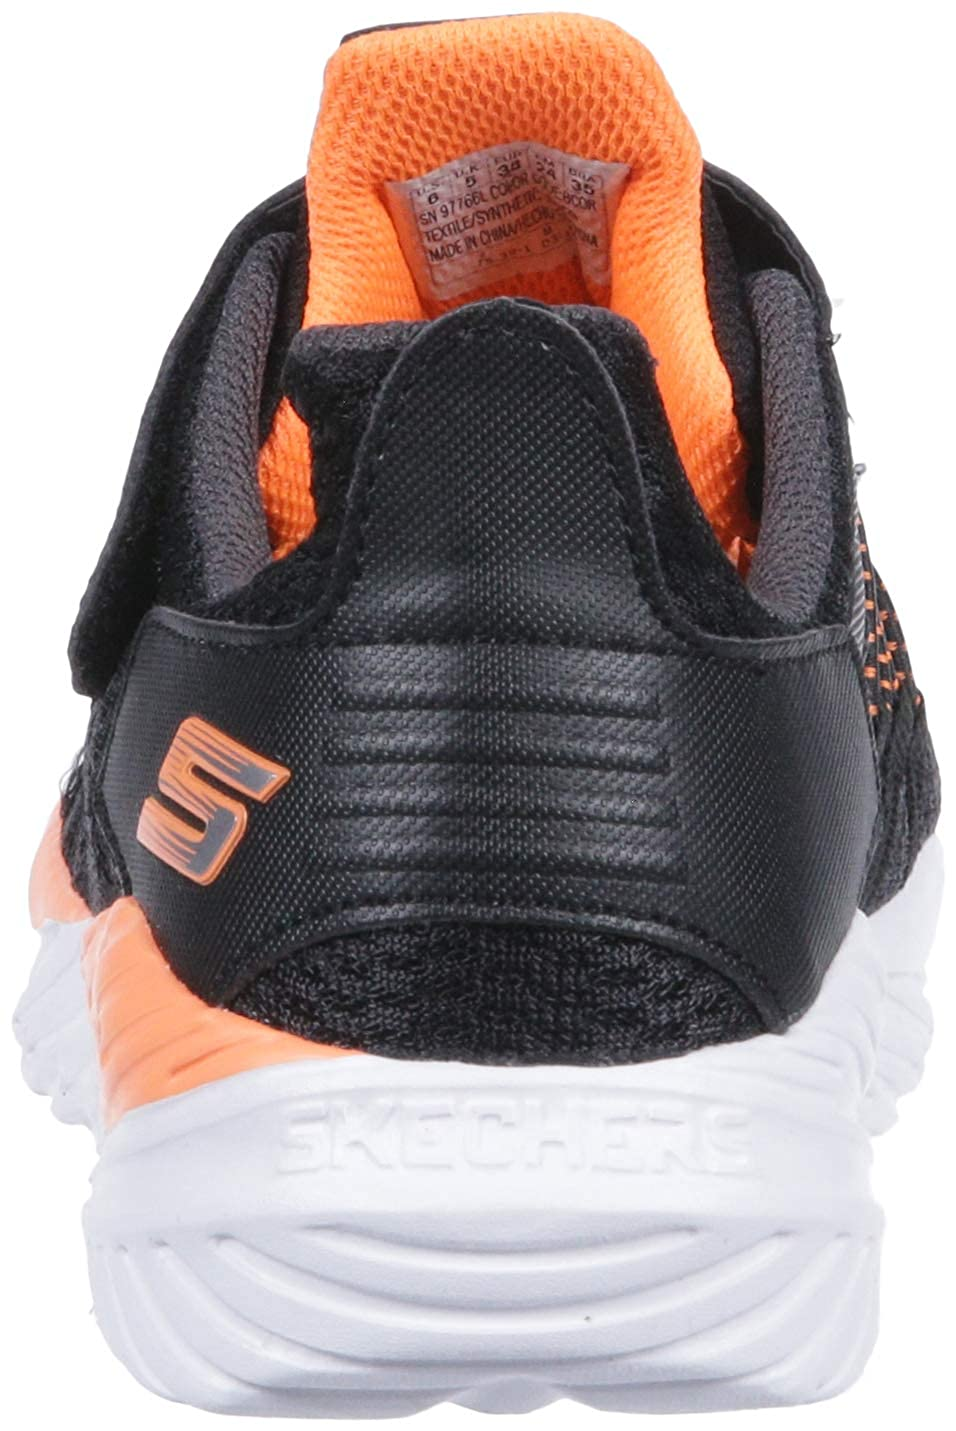 Vector Shift Sneaker, Skechers Kids Nitro Sprint